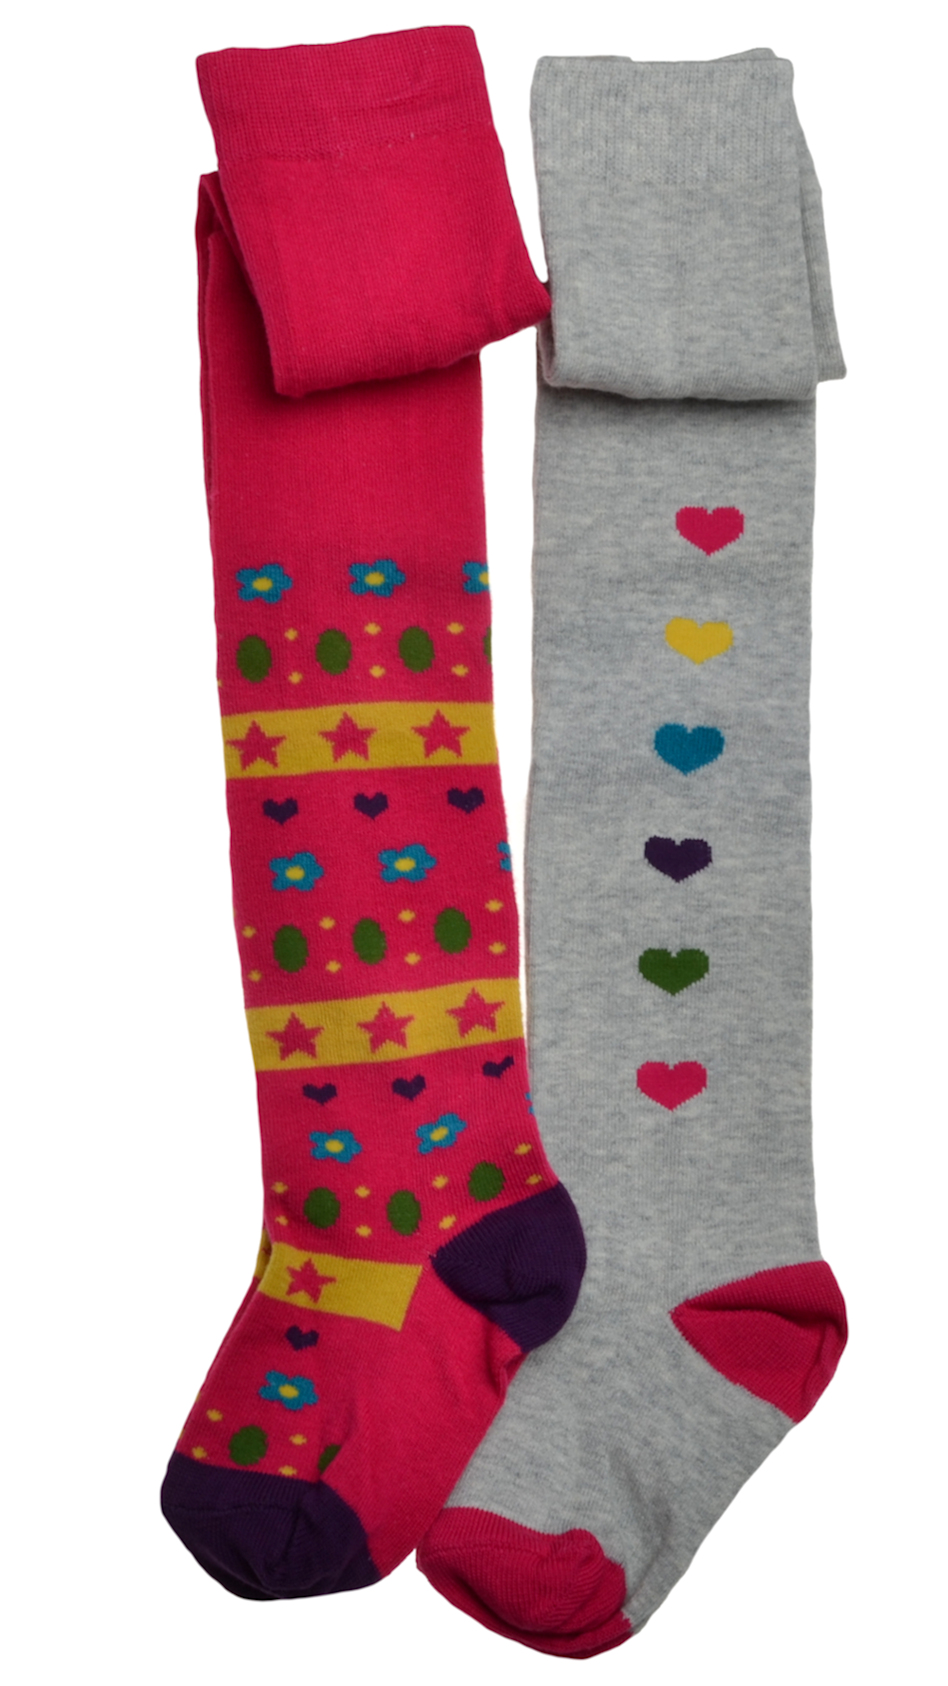 WB Socks 2 Paar Baby Strumpfhosen,wei/ß,18-24 Monate